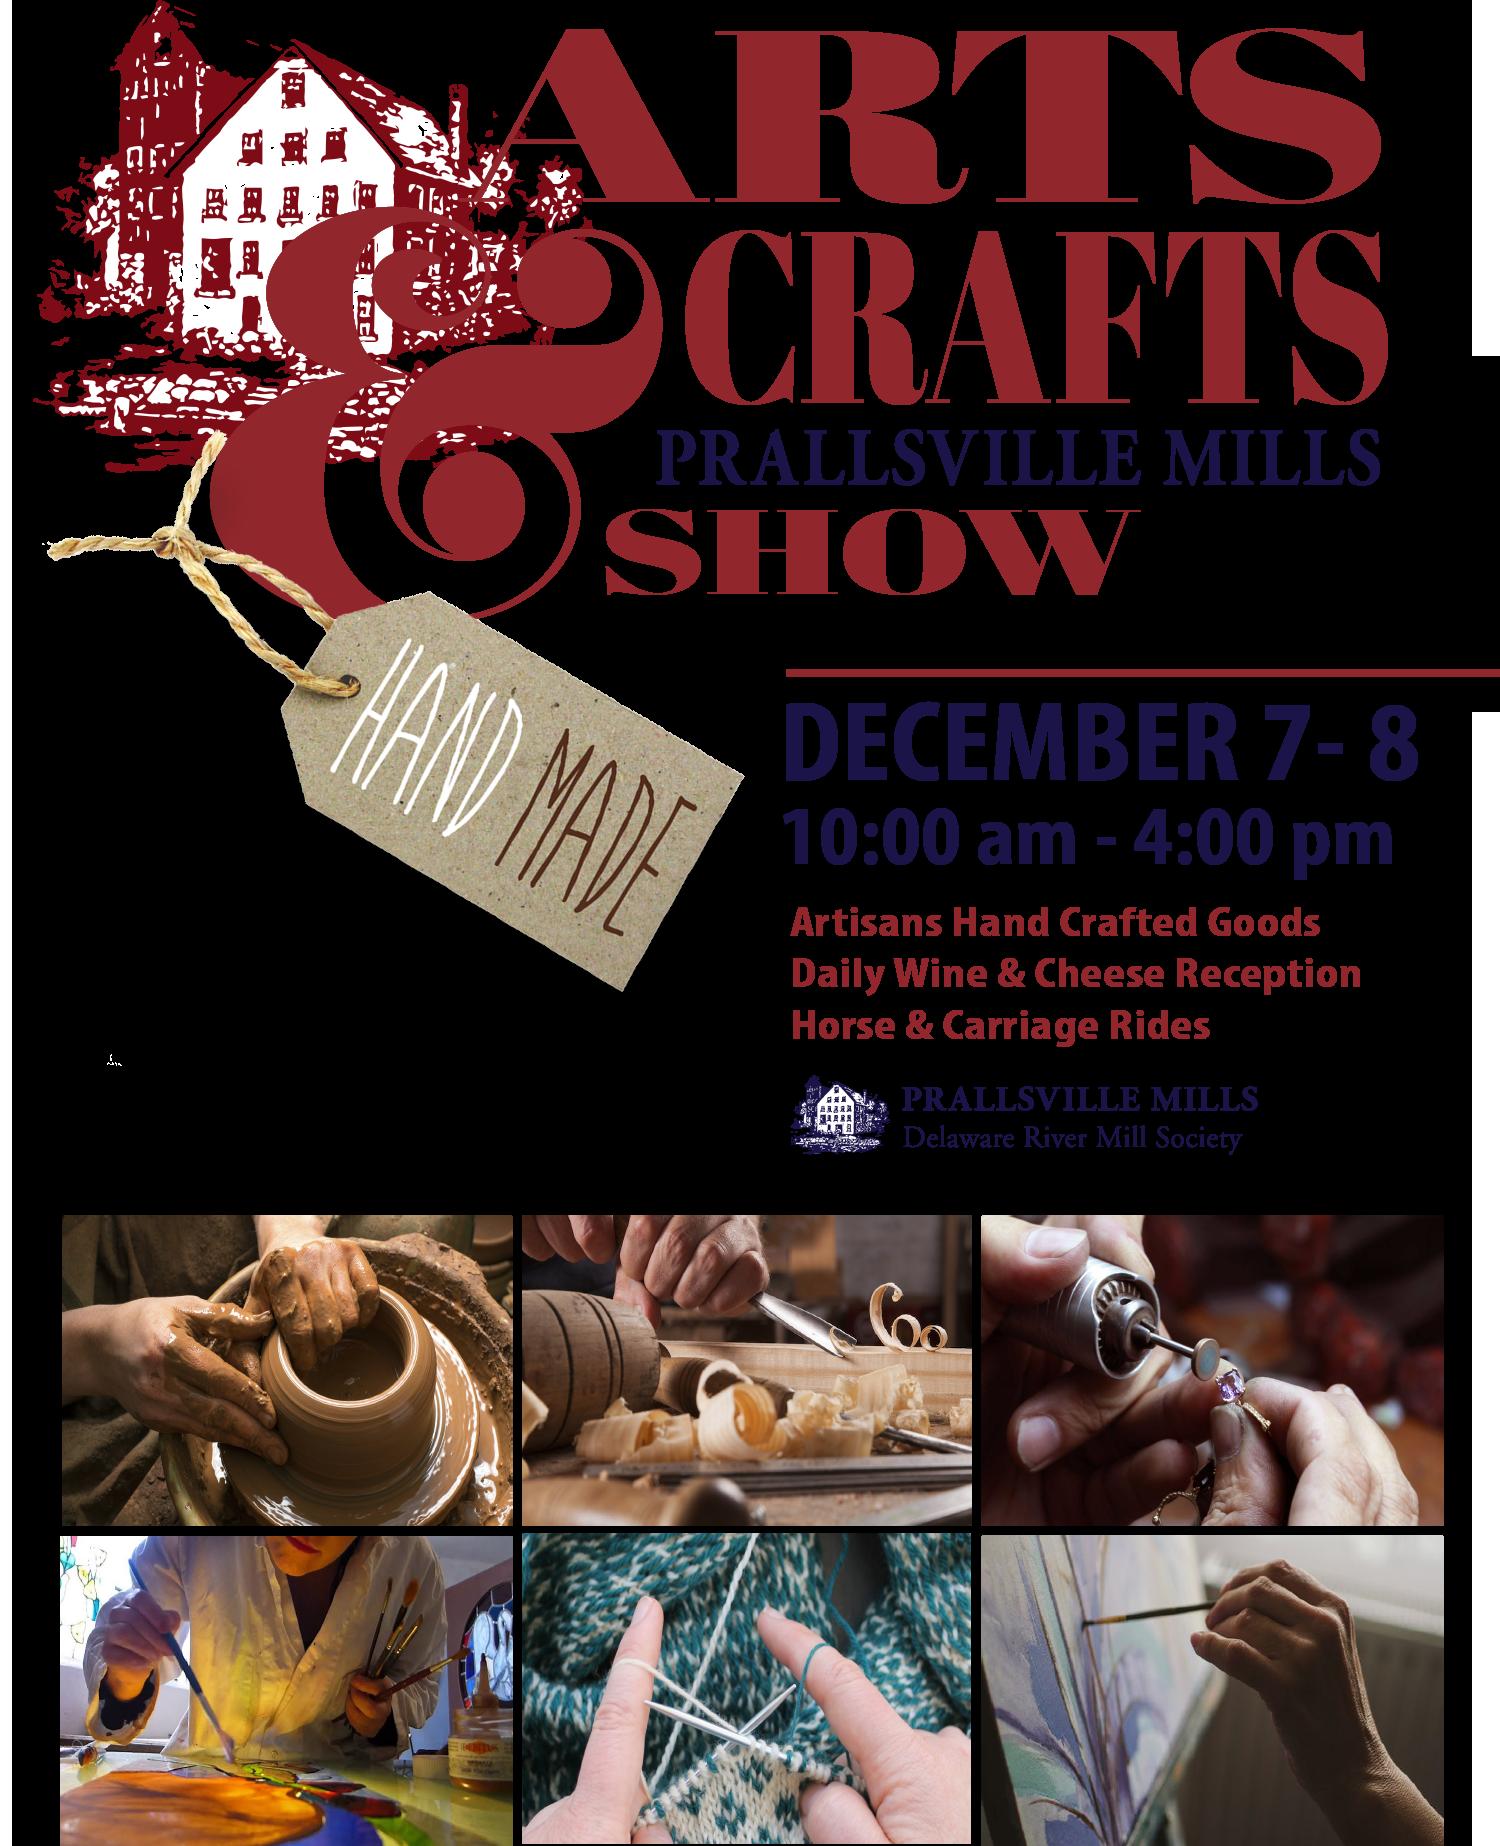 Arts & Crafts 2019 Show (1) (1).png